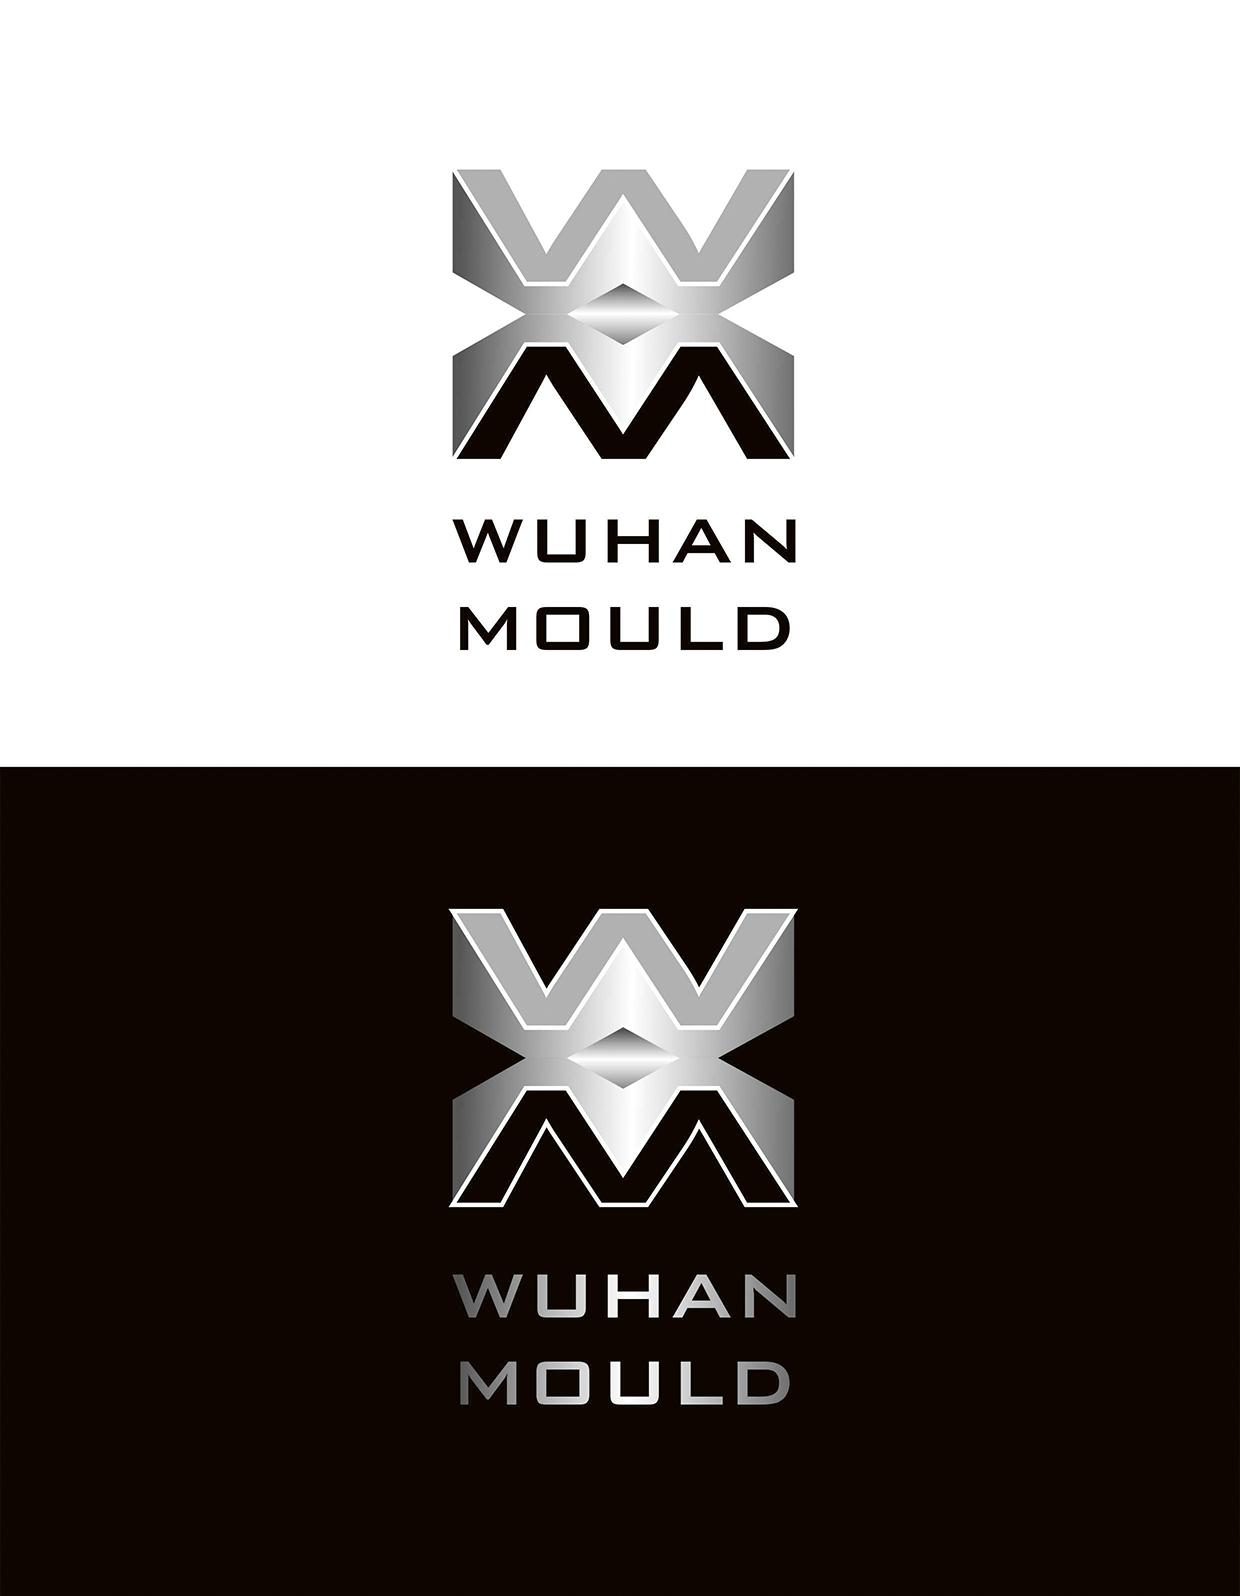 Создать логотип для фабрики пресс-форм фото f_22759909b7756bc7.jpg